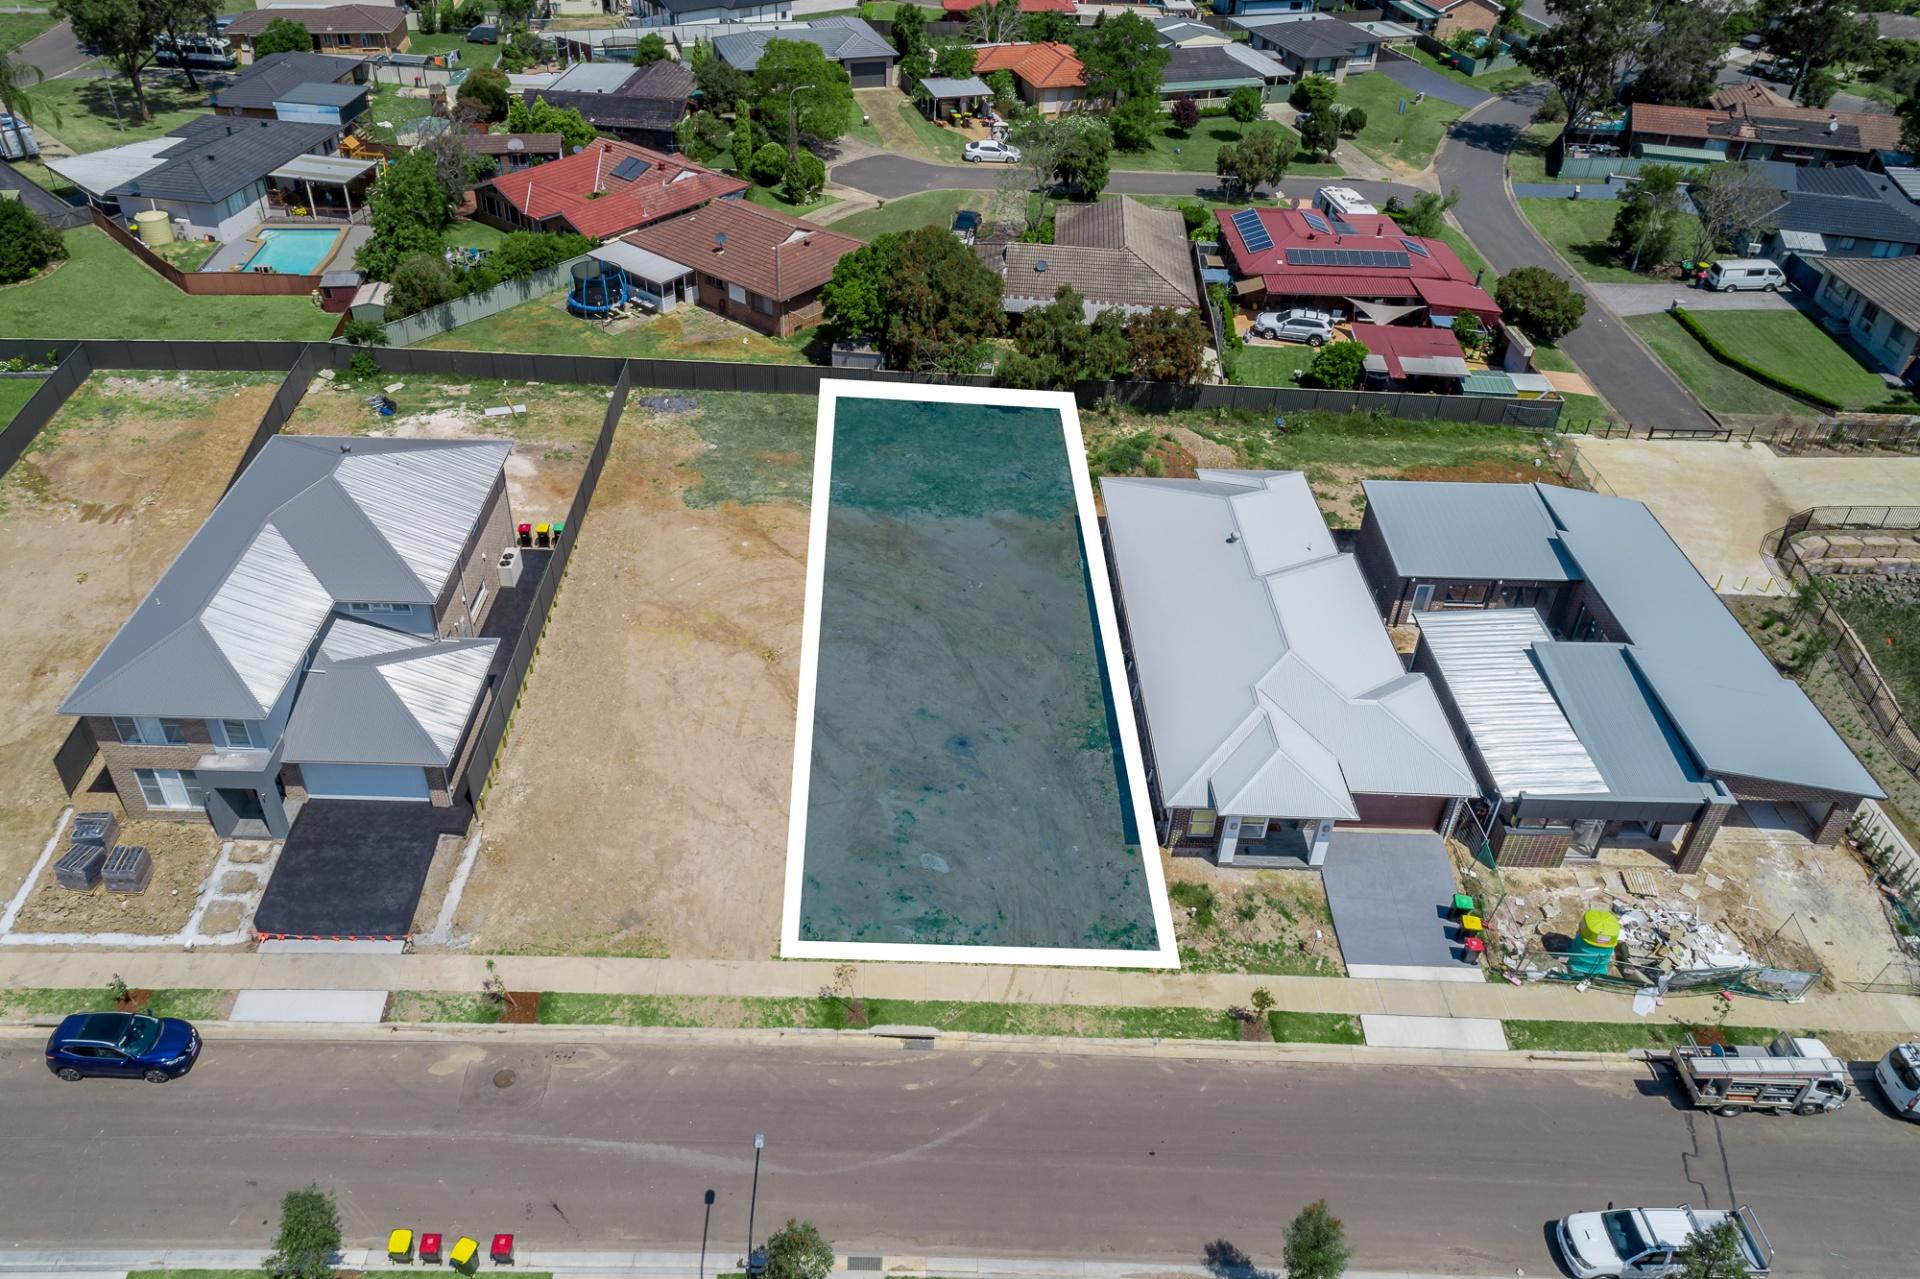 Land, Sold , Epaulet Circuit, Listing ID 1373, Jordan Springs, NSW, Australia,